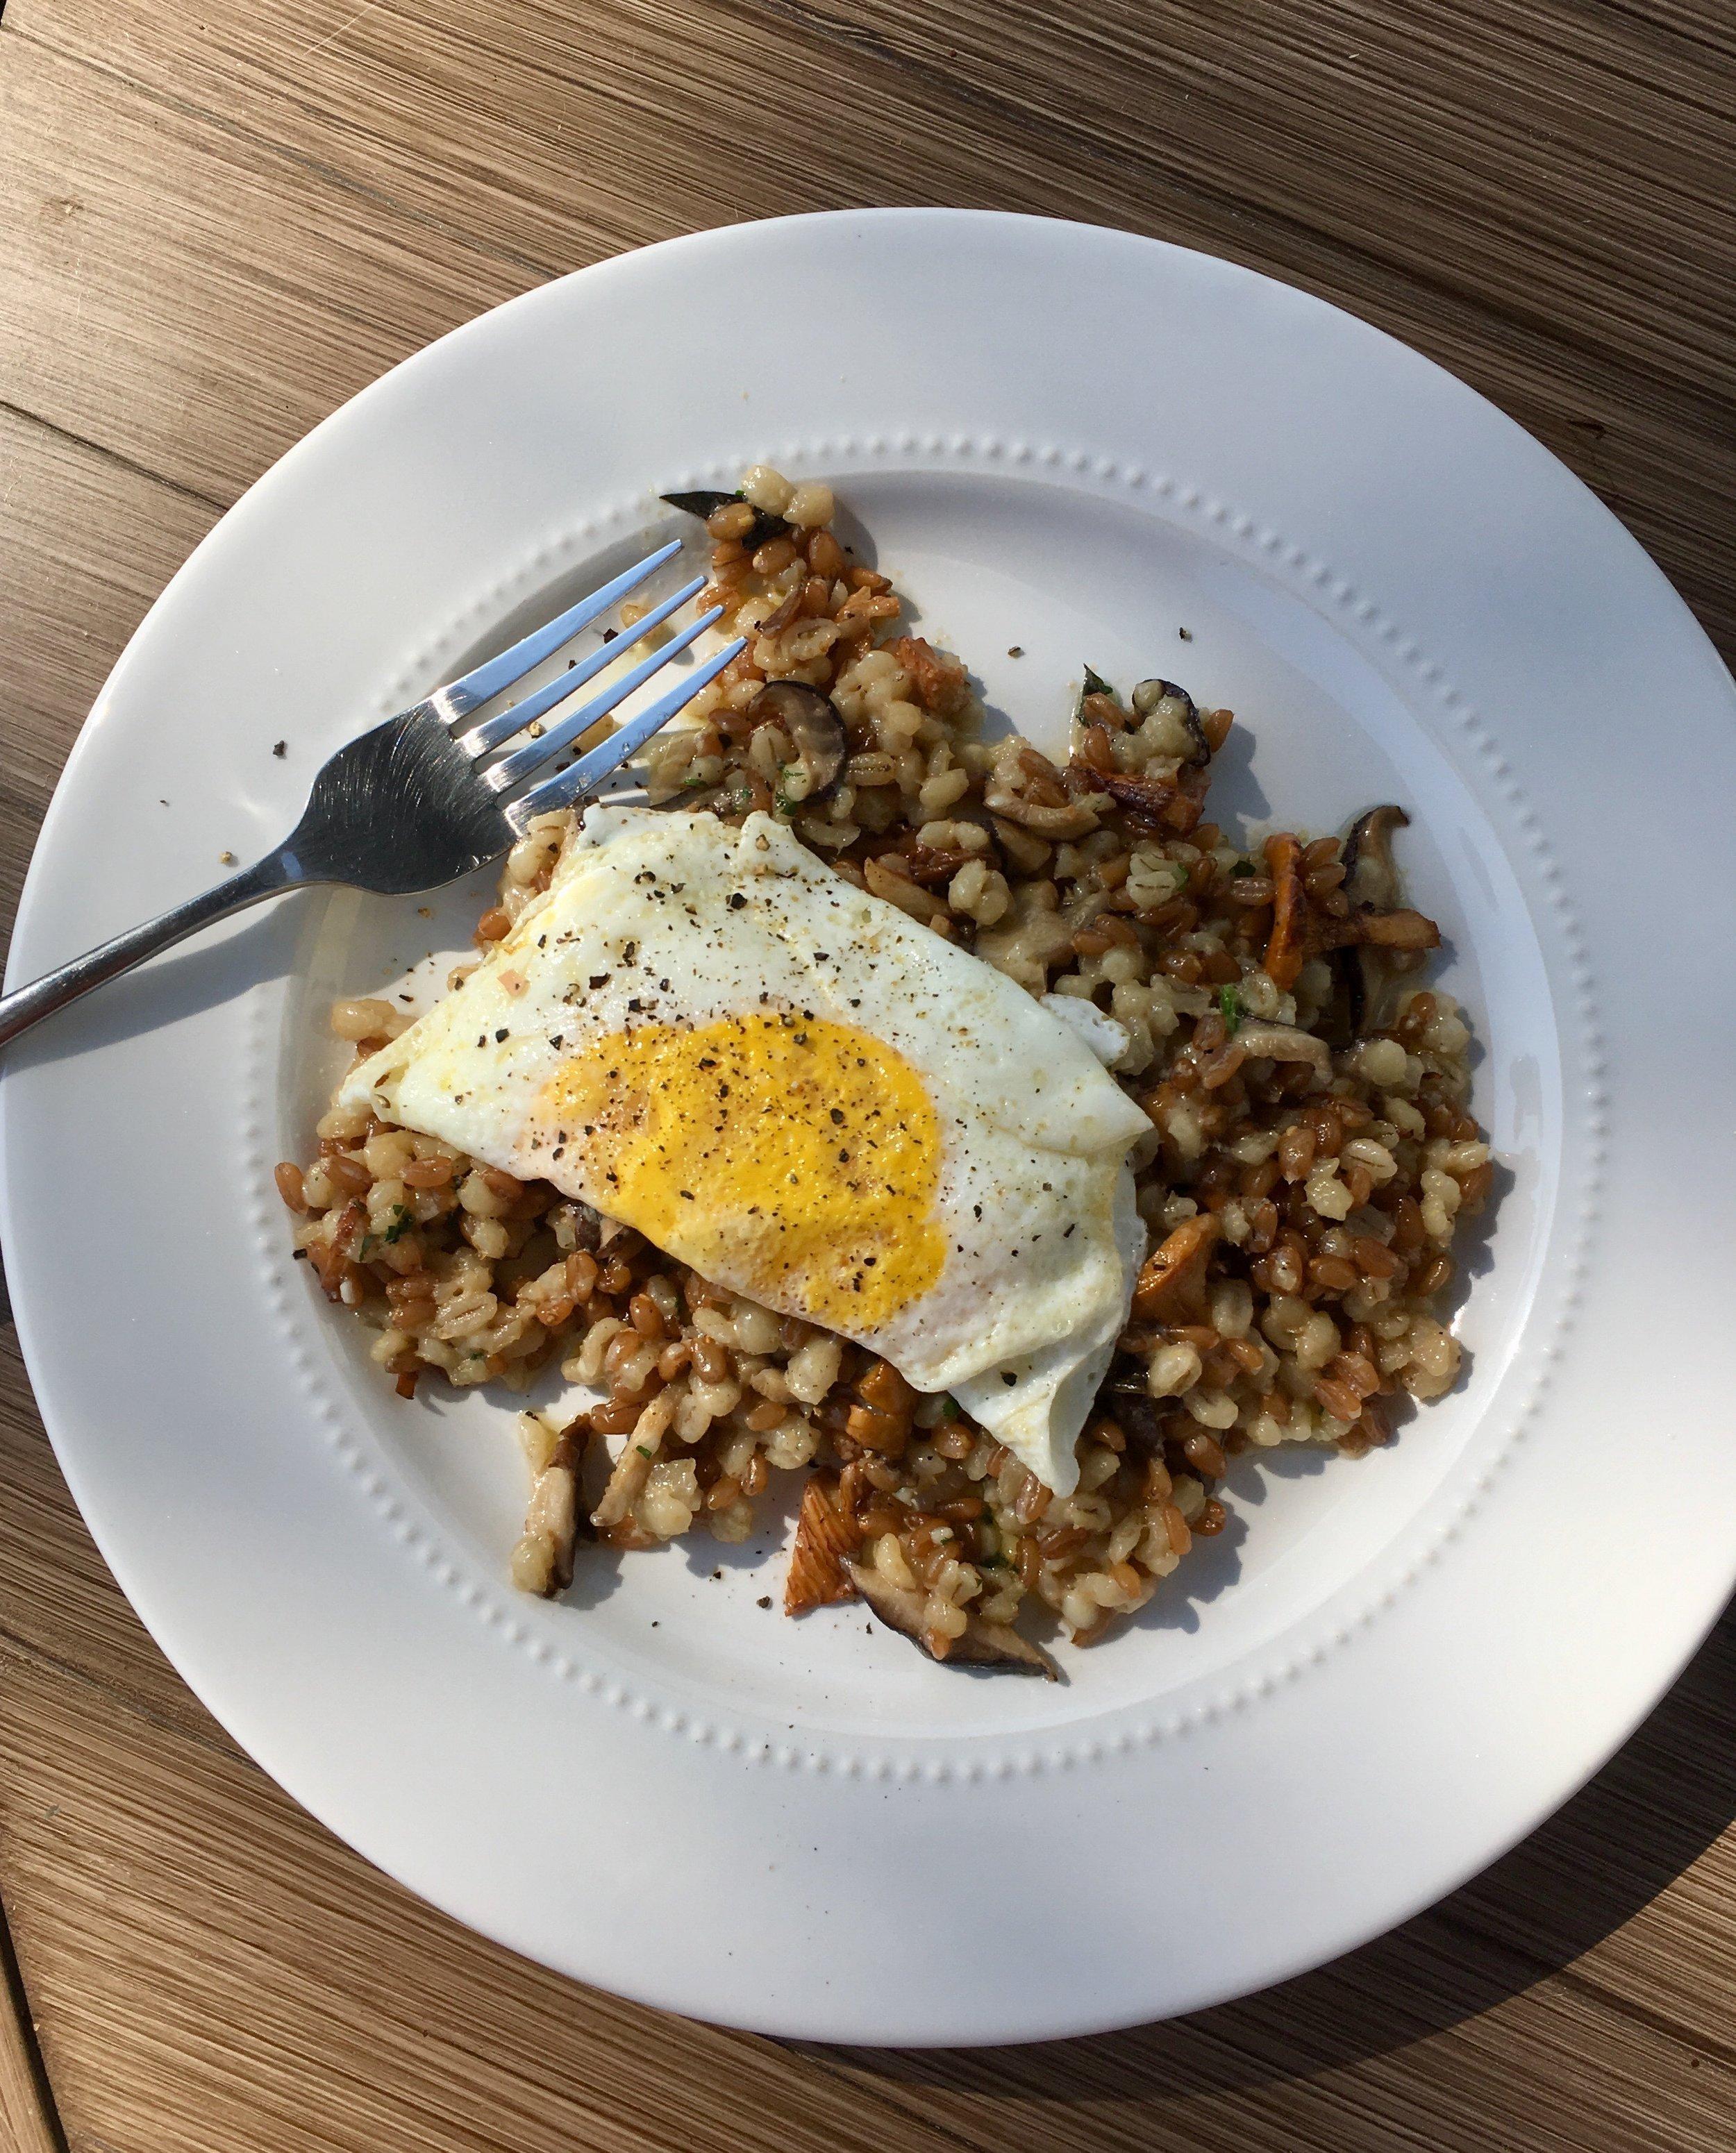 Stonecat wild mushroom risotto for breakfast